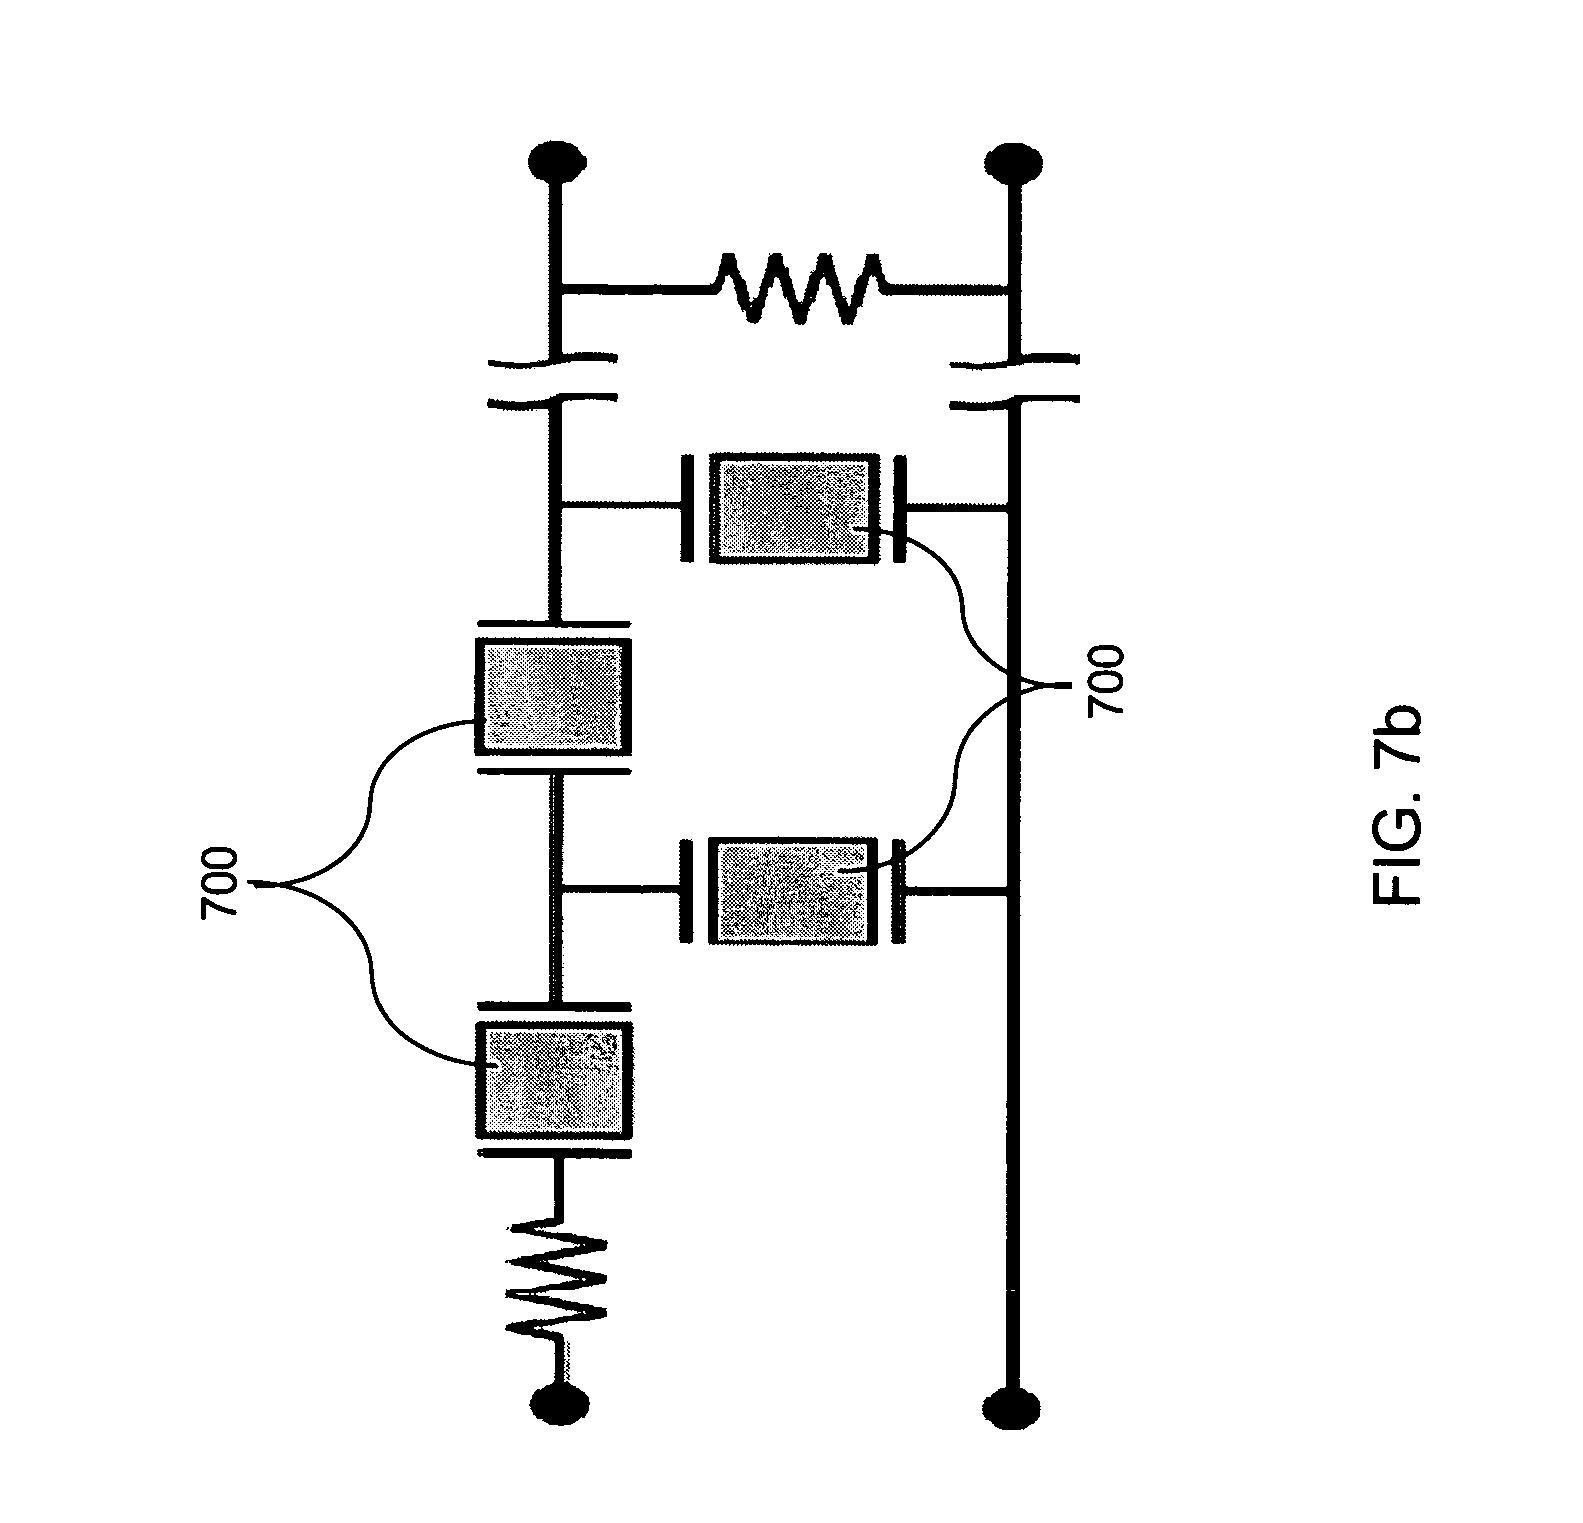 MEMS-based Broadband Transceiver/sensor